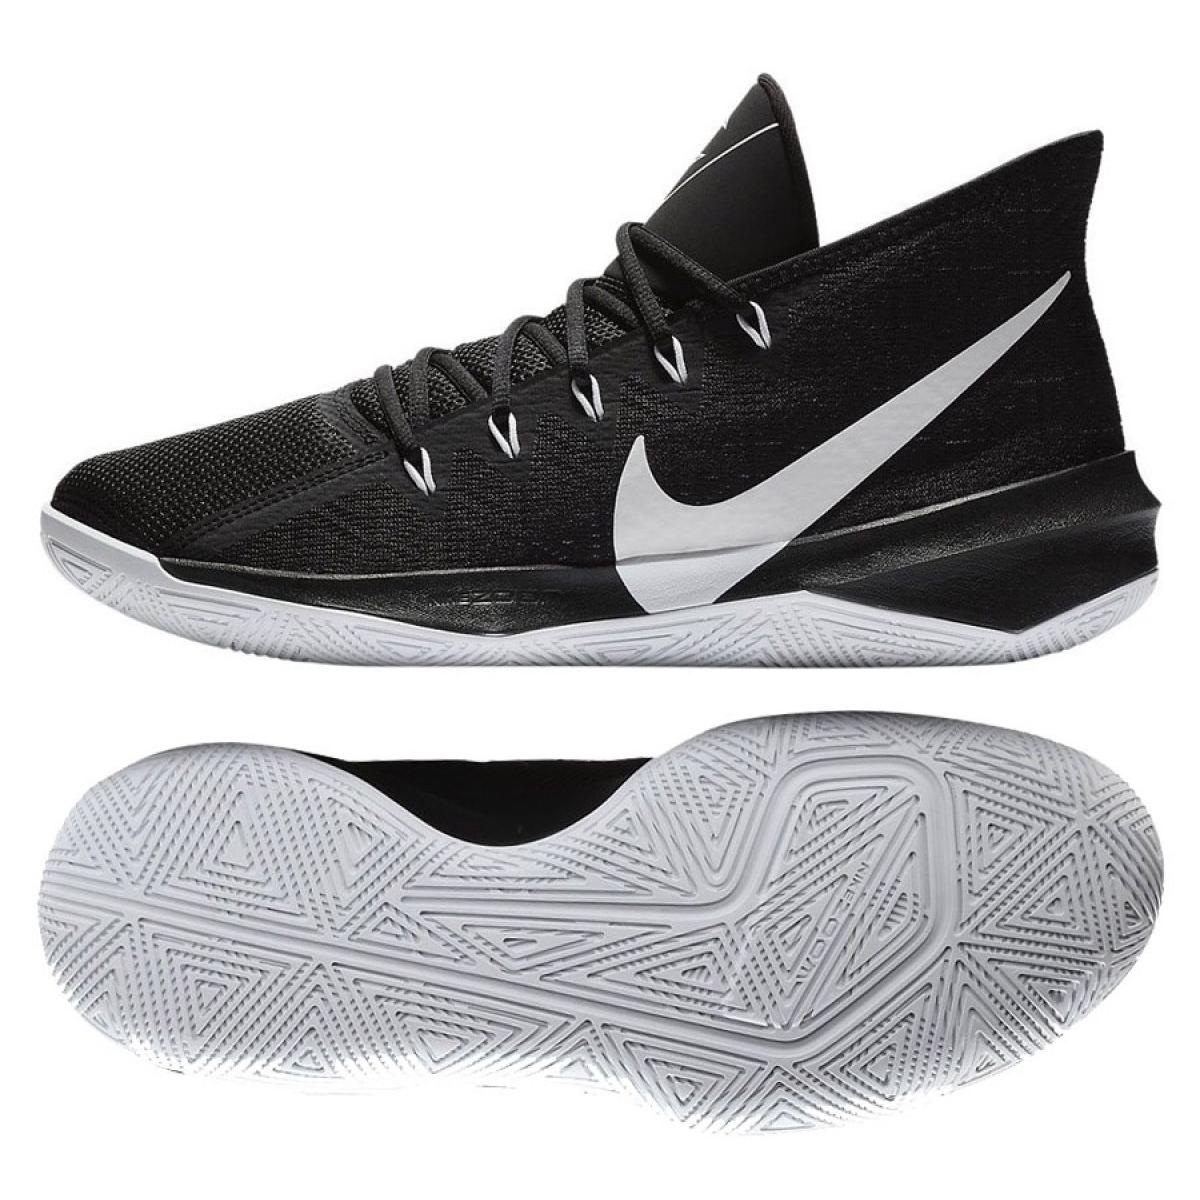 Iii Nike De Baloncesto Zapatillas Zoom M 002 Evidence Aj5904 WCxorQdeB